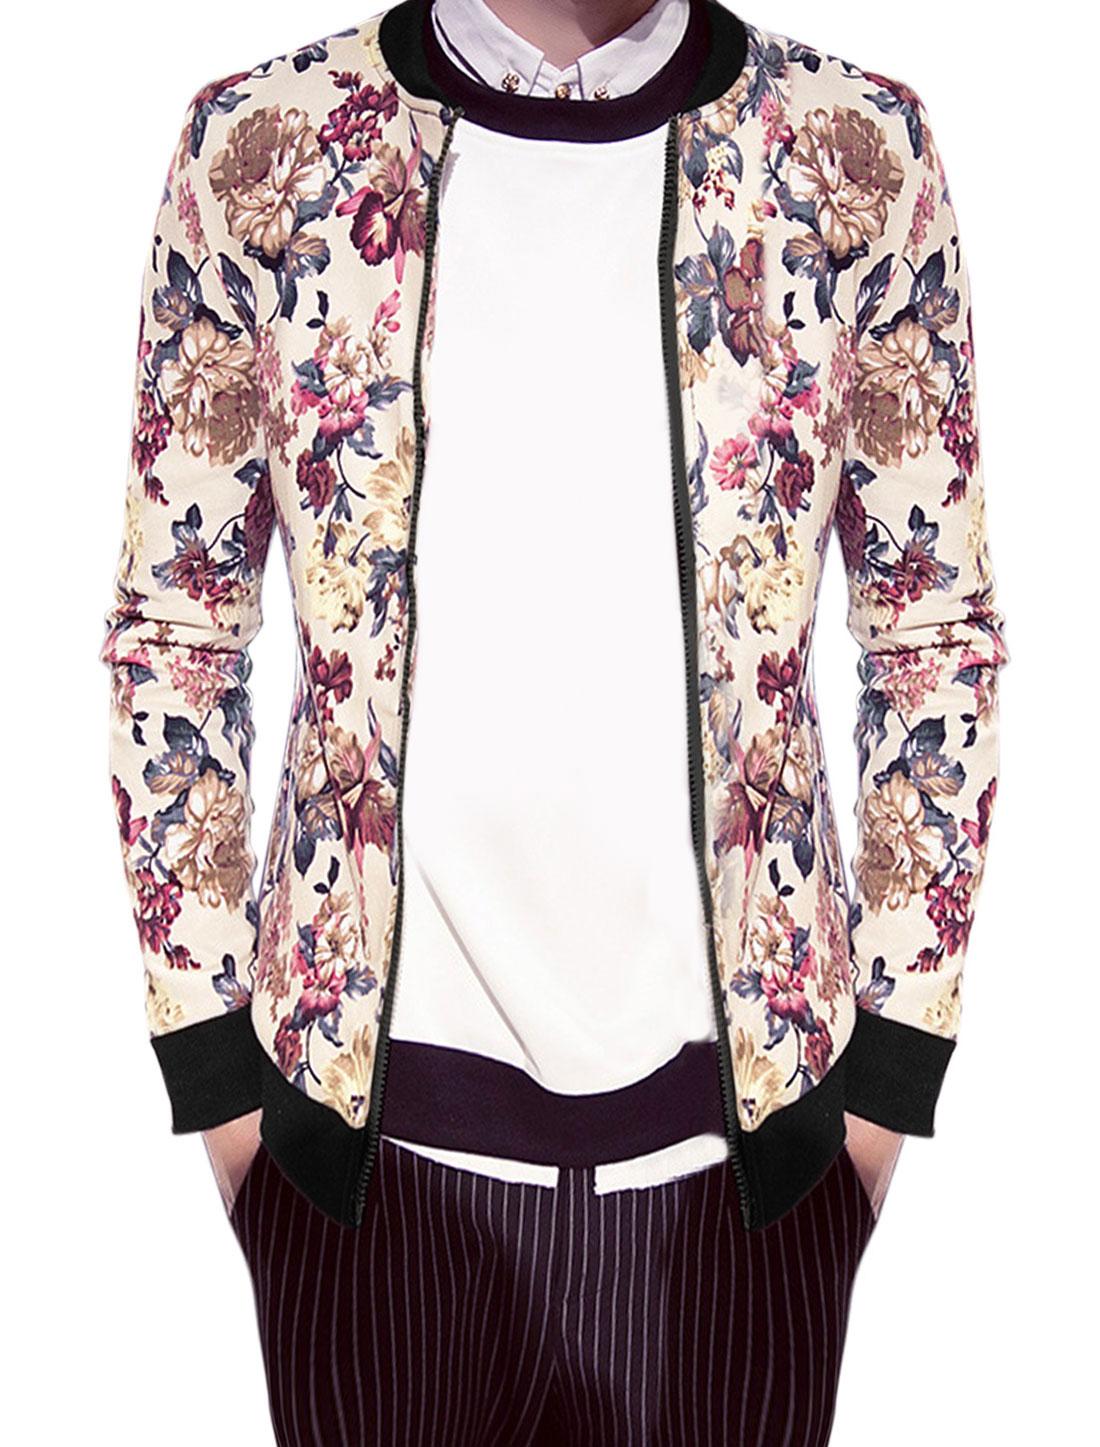 Men Stand Collar Zip Up Floral Prints Varsity Jacket Beige M